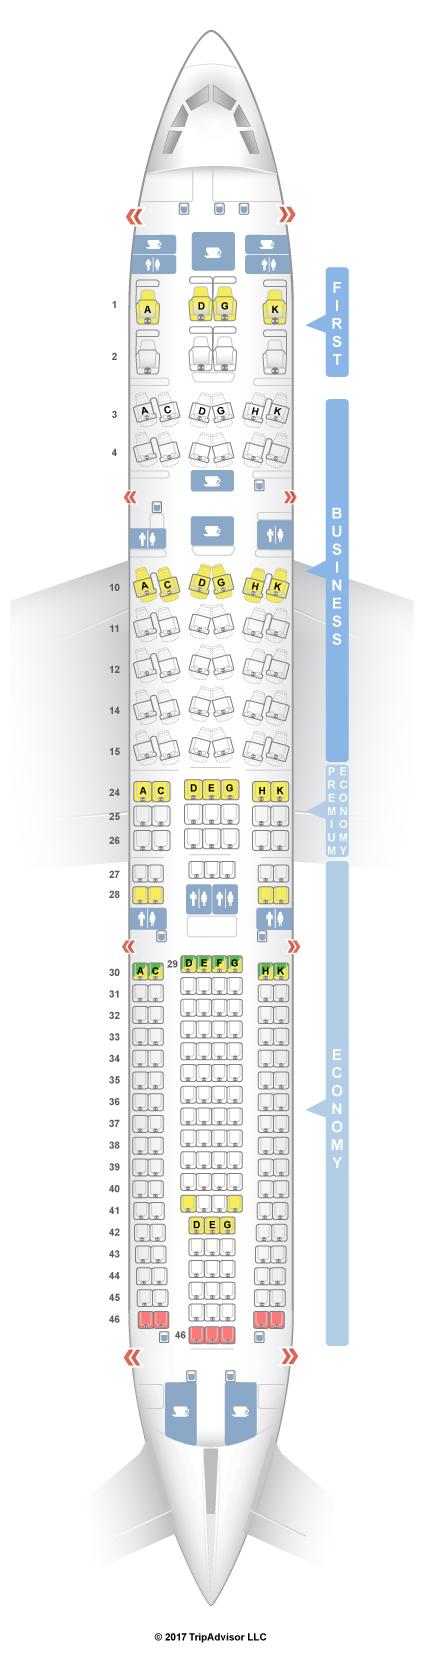 Seatguru Seat Map Lufthansa Airbus A330 300 333 V2